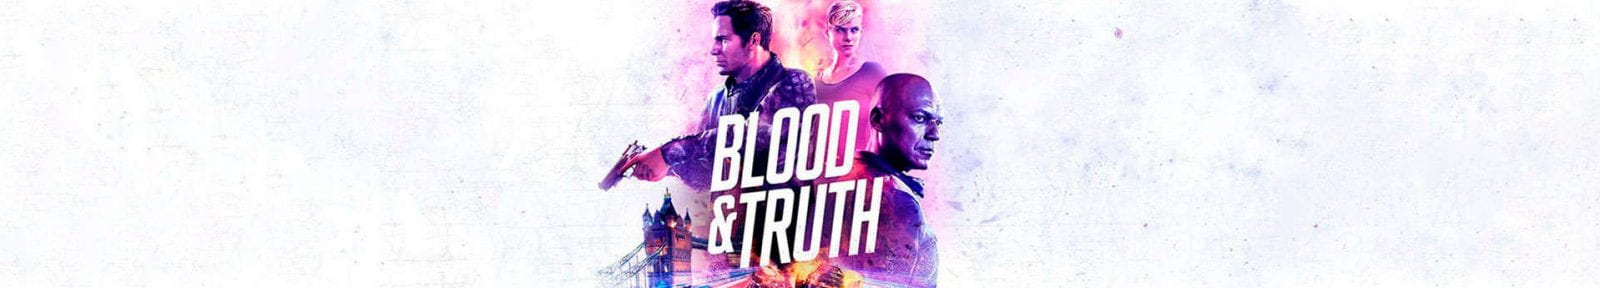 Blood and Truth Juego exclusivo de Playstaiton VR